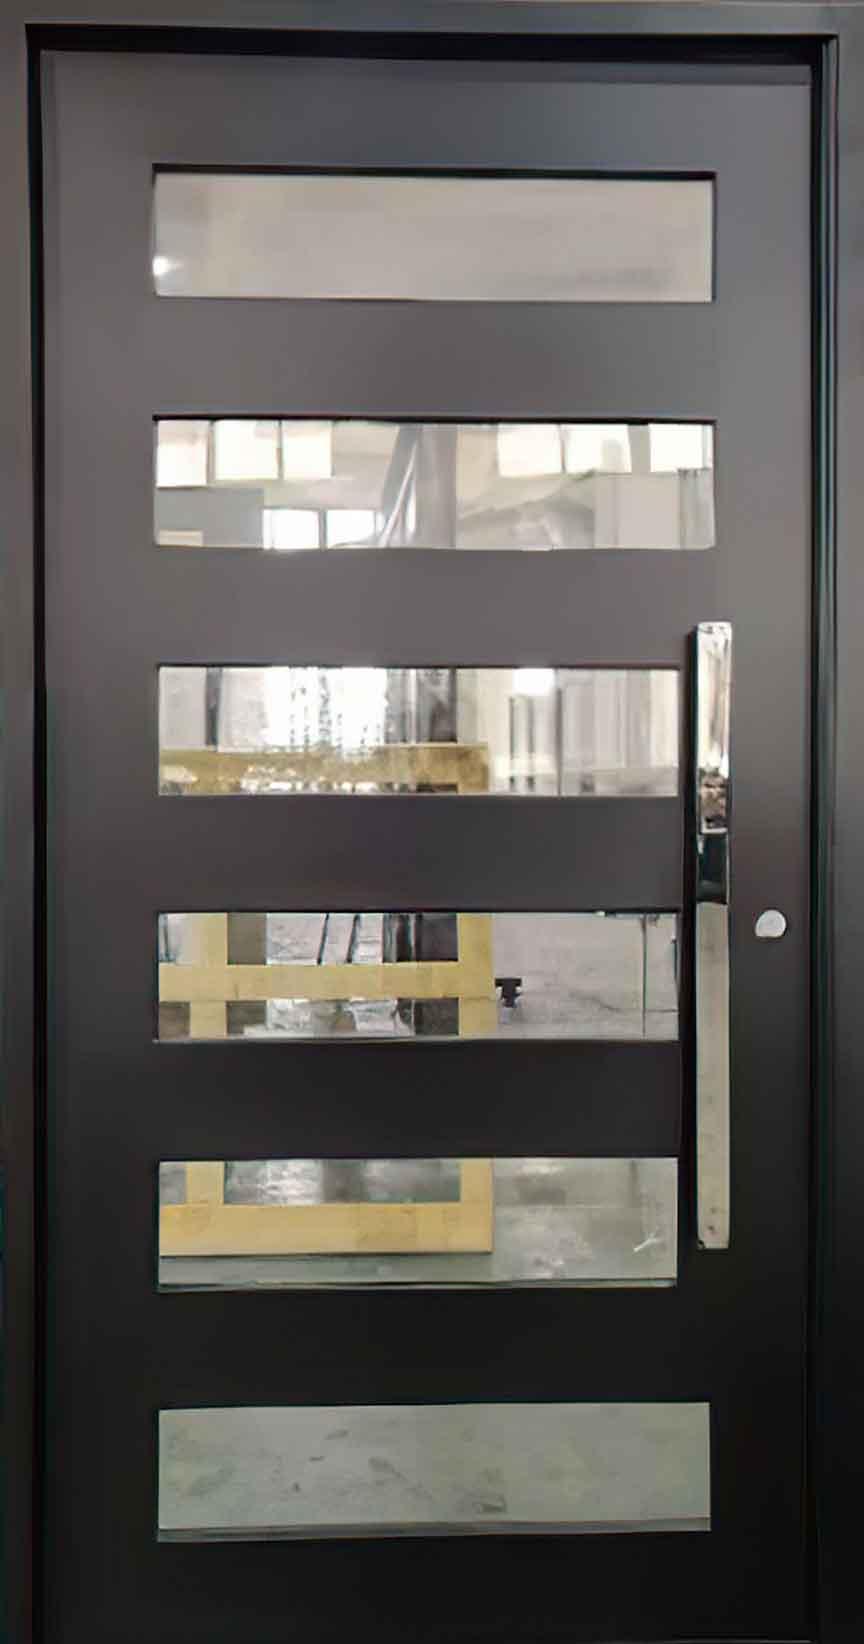 The Smith Iron Pivot Door